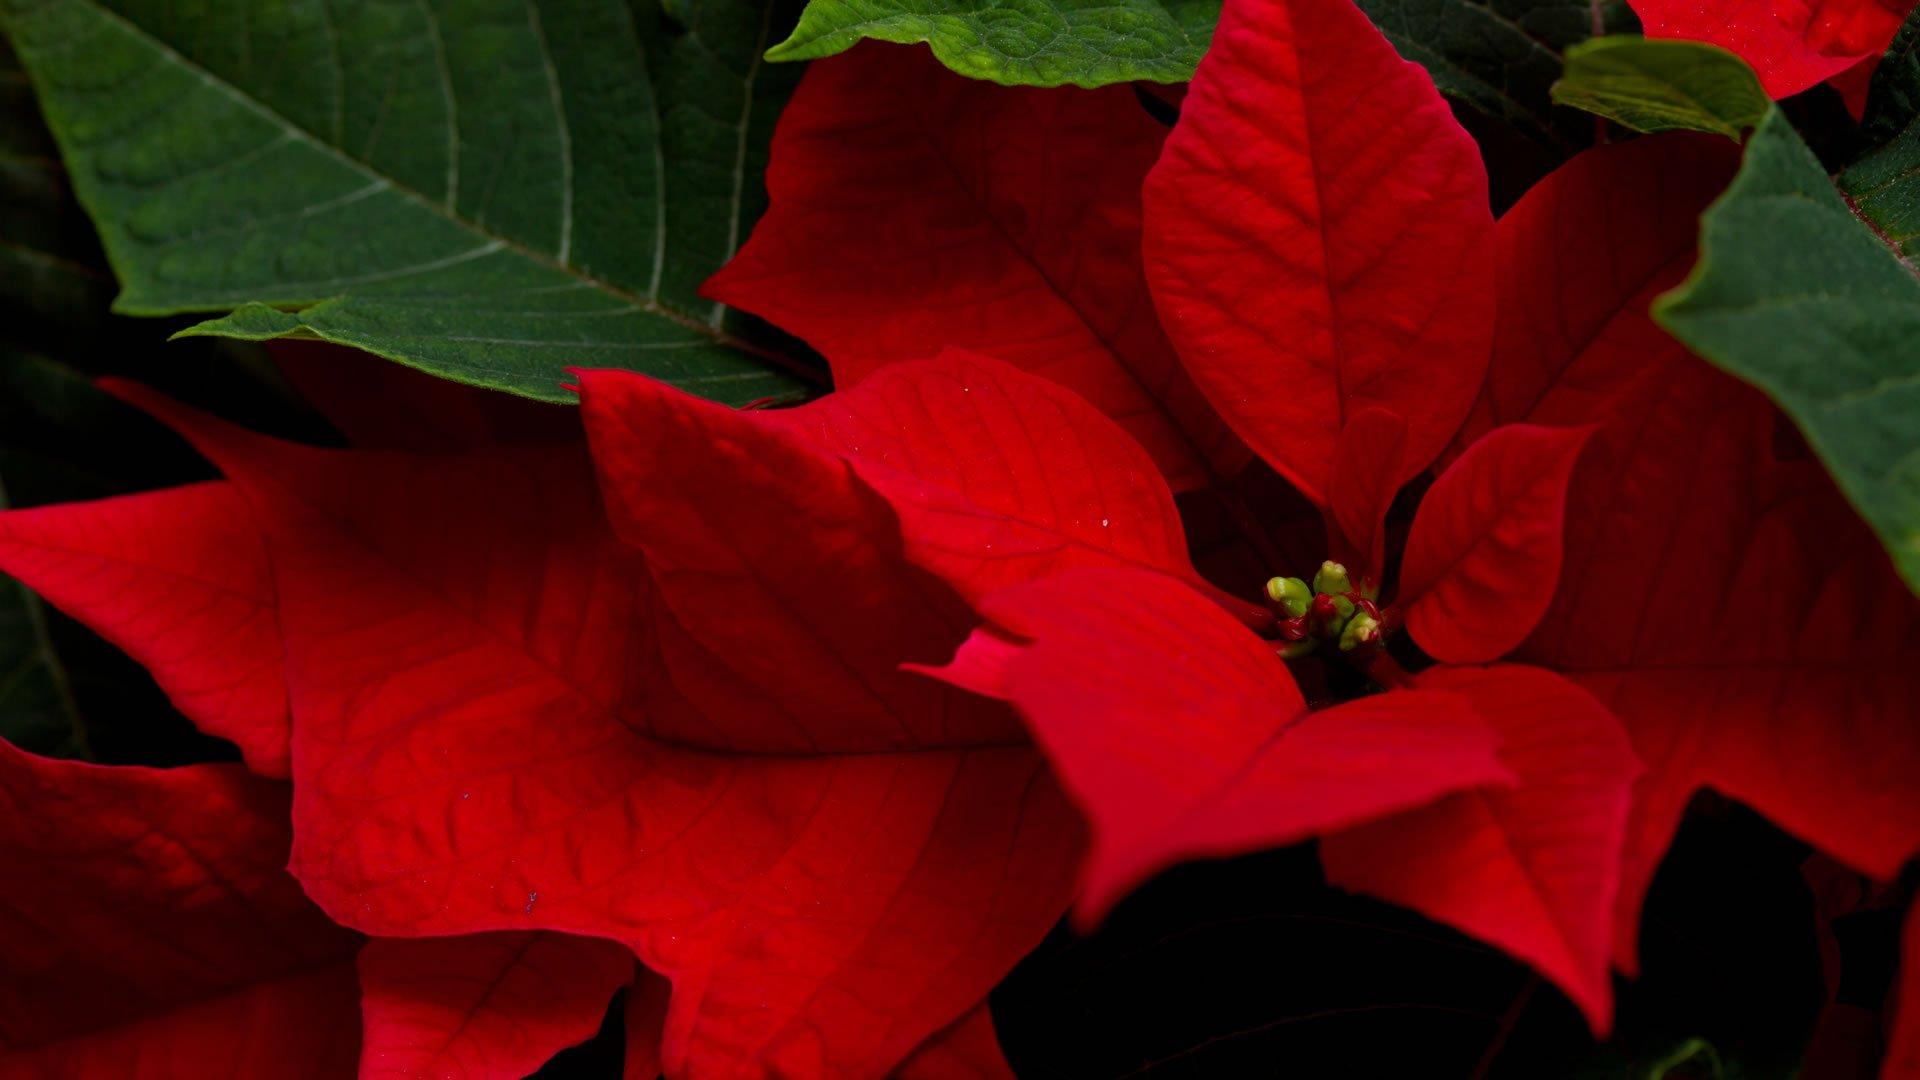 La poisentia o flor de pascua - Imagenes flores de navidad ...